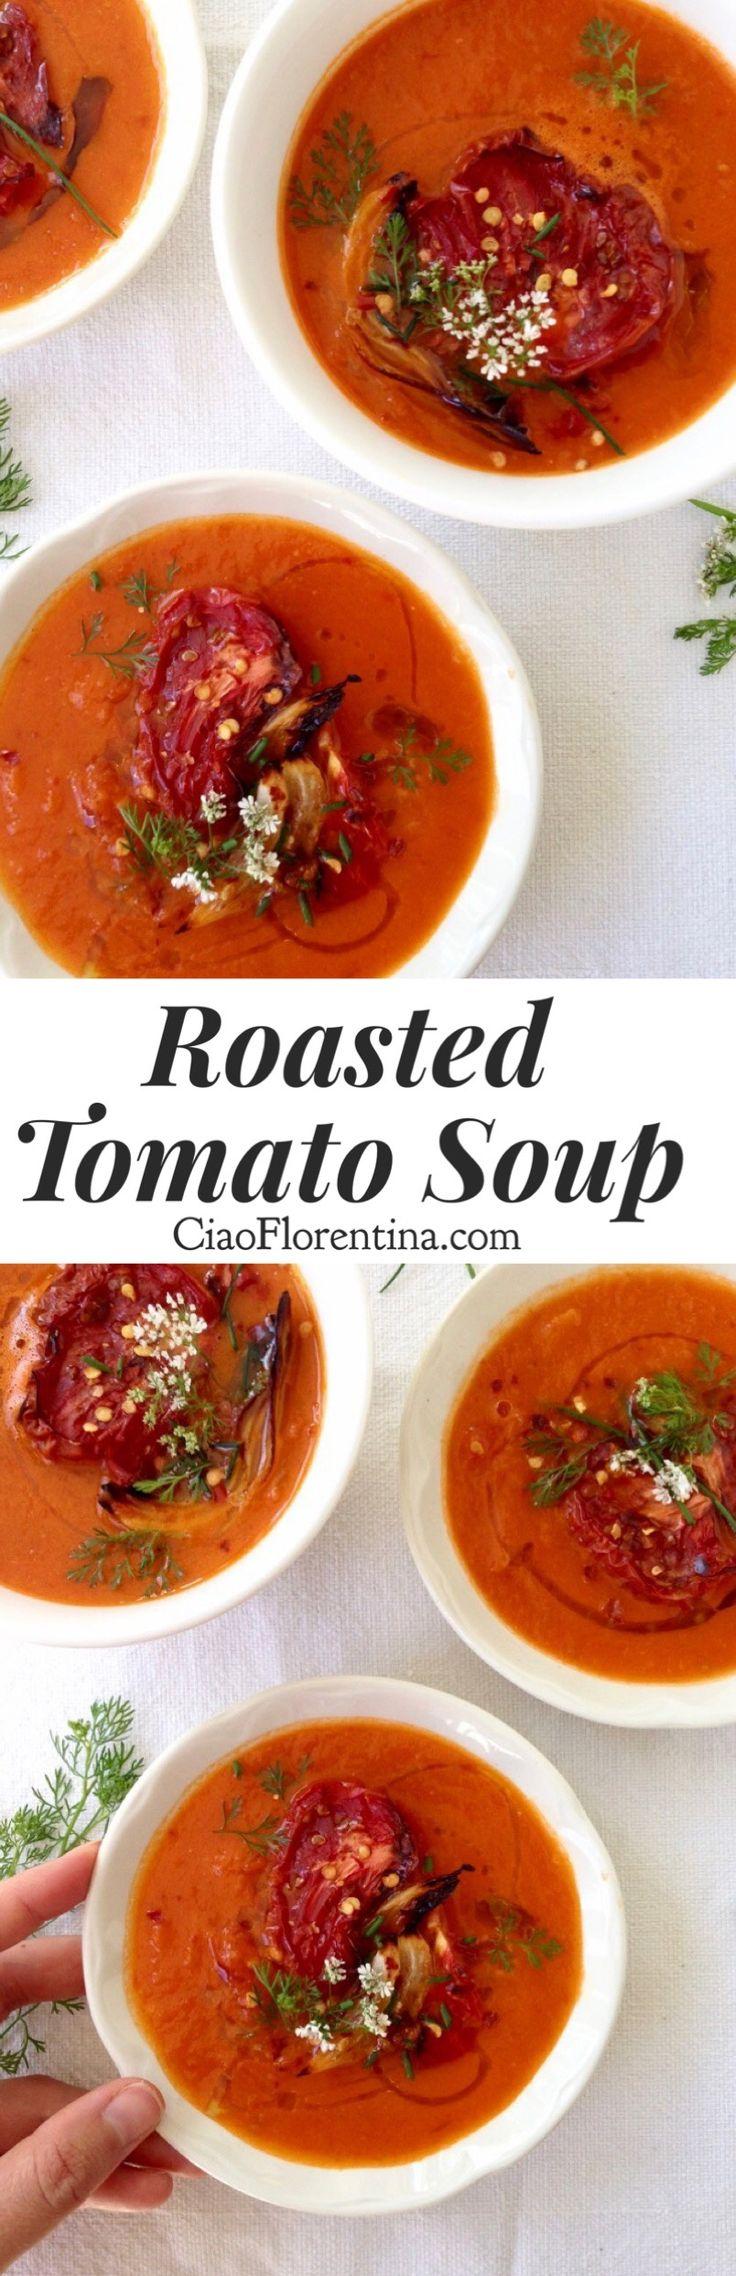 Roasted Tomato Soup Recipe with Heirloom Tomatoes, Garlic and Herbs  | CiaoFlorentina.com @CiaoFlorentina